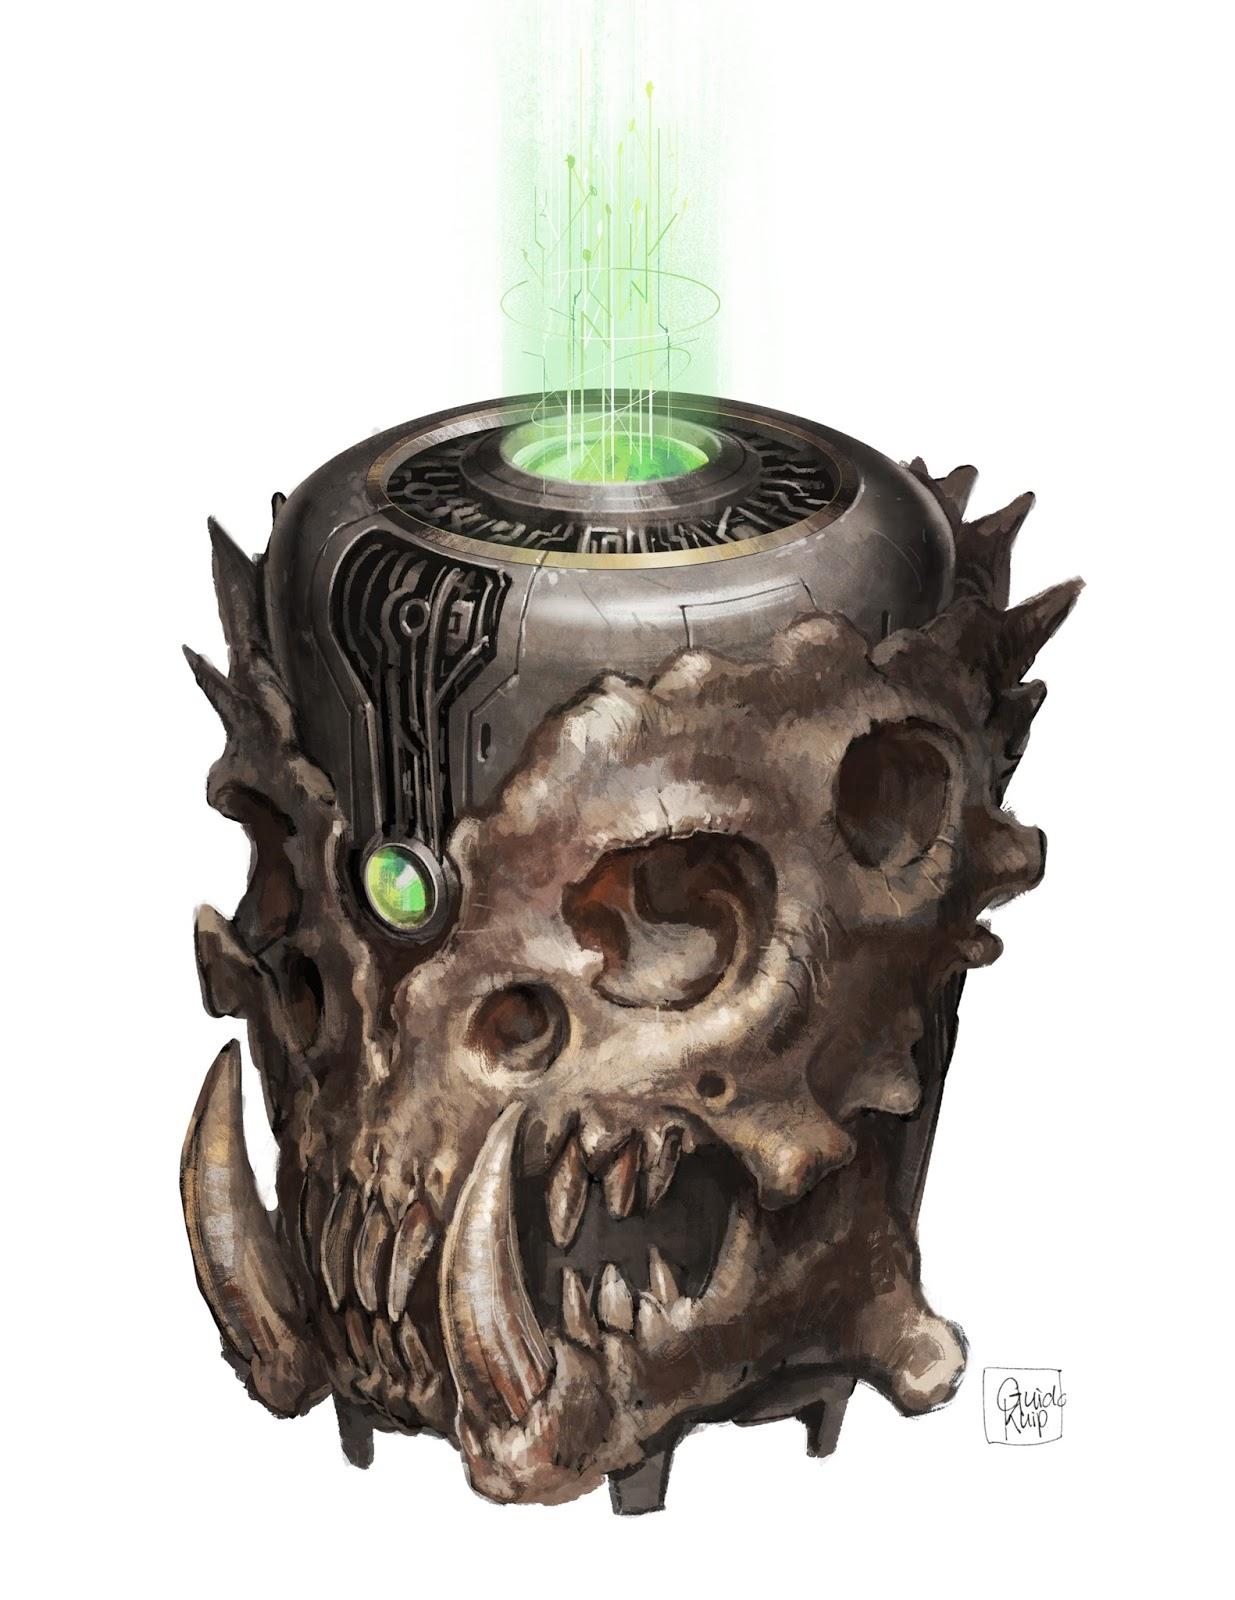 Guido Kuip: Interior art - Paizo Games/ Starfinder Alien